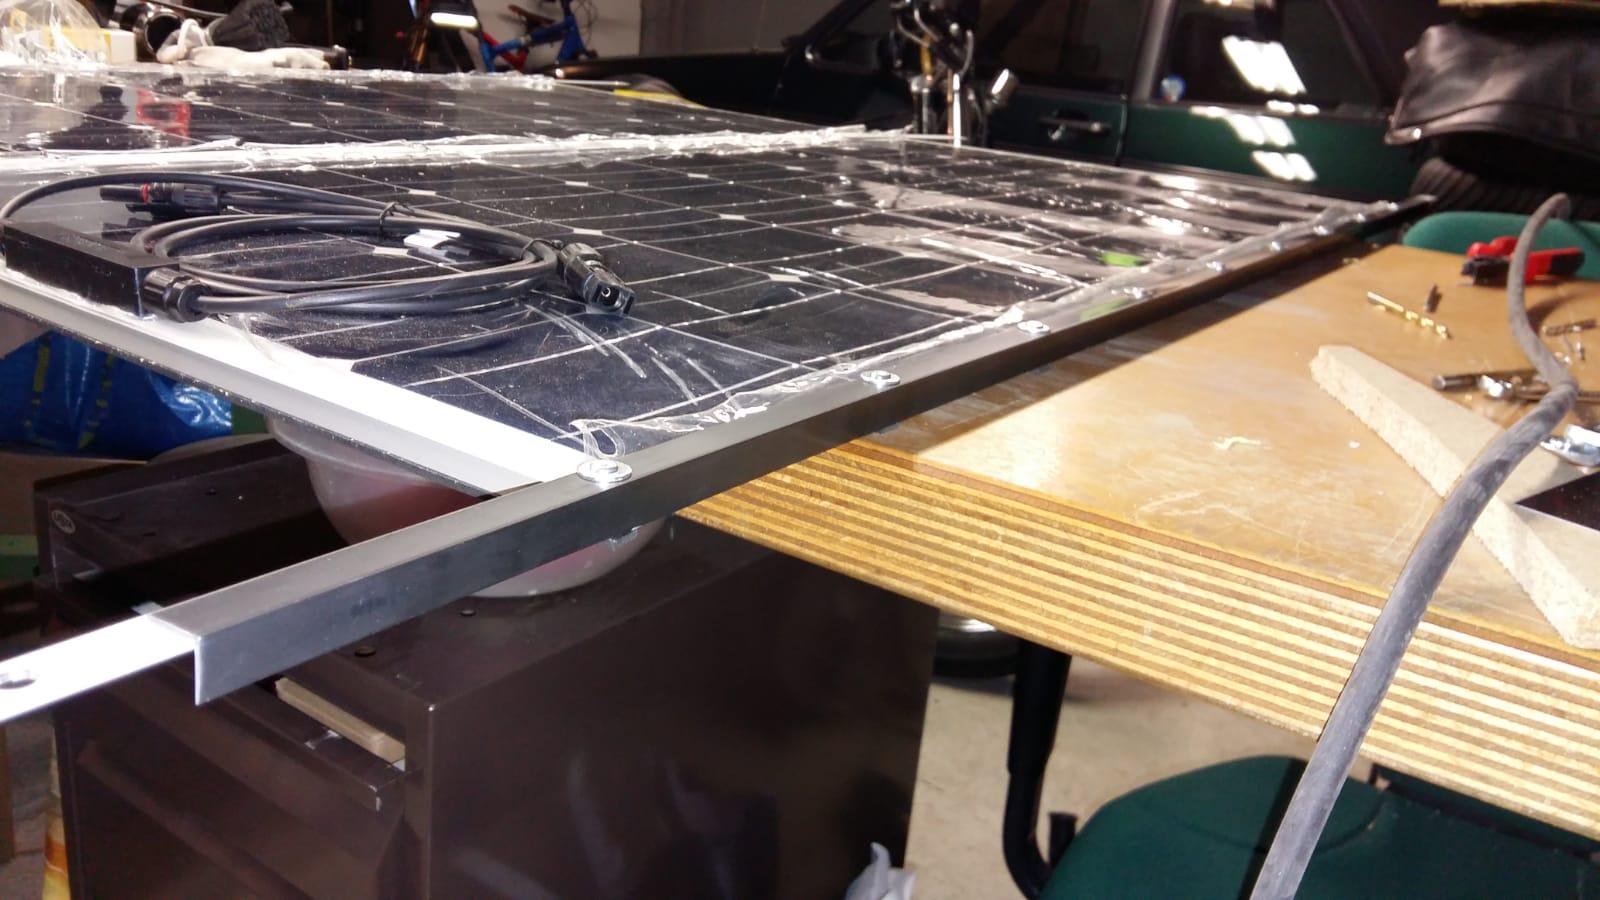 Panneaux solaires - c'est partiiiii Whatsa36